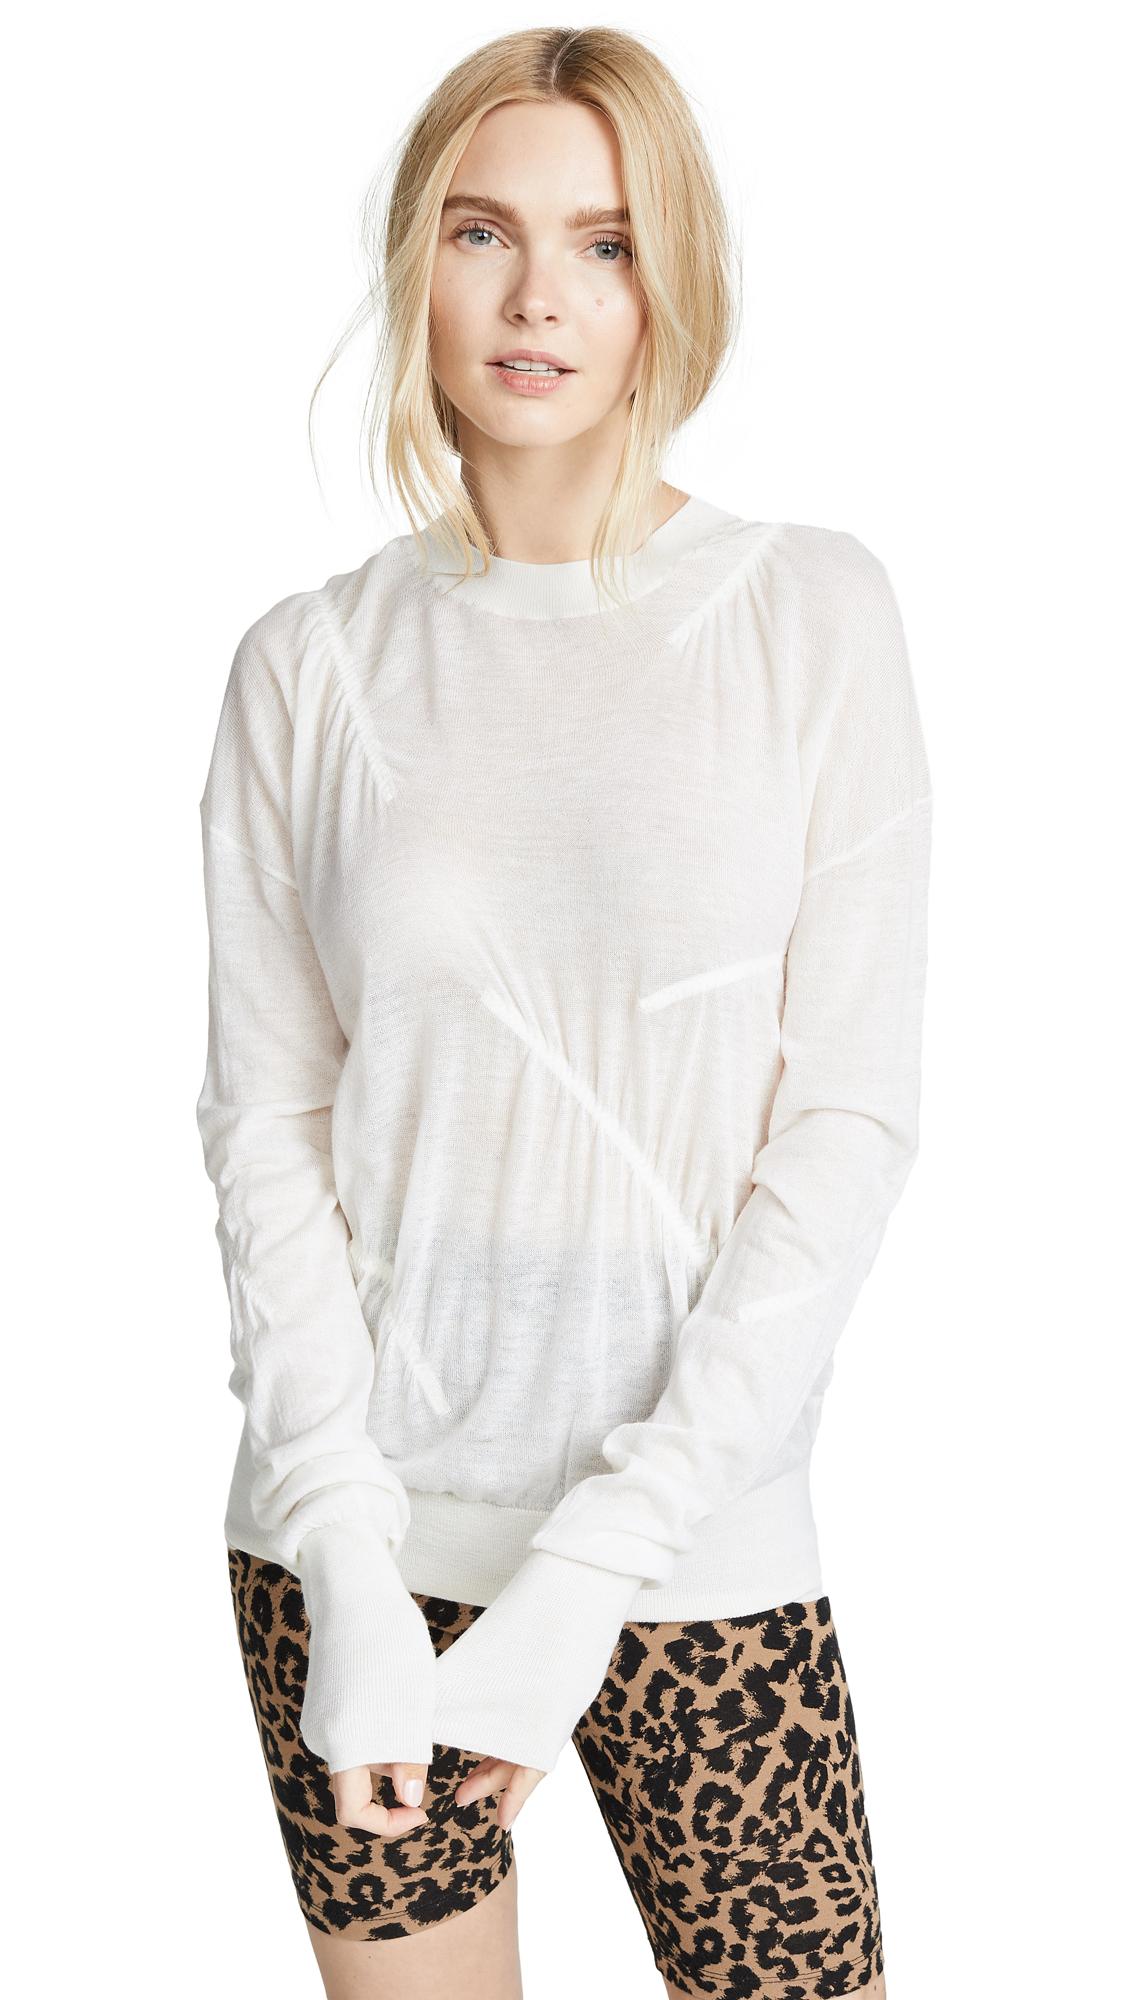 Helmut Lang Elasticated Cashmere Pullover - Bleach